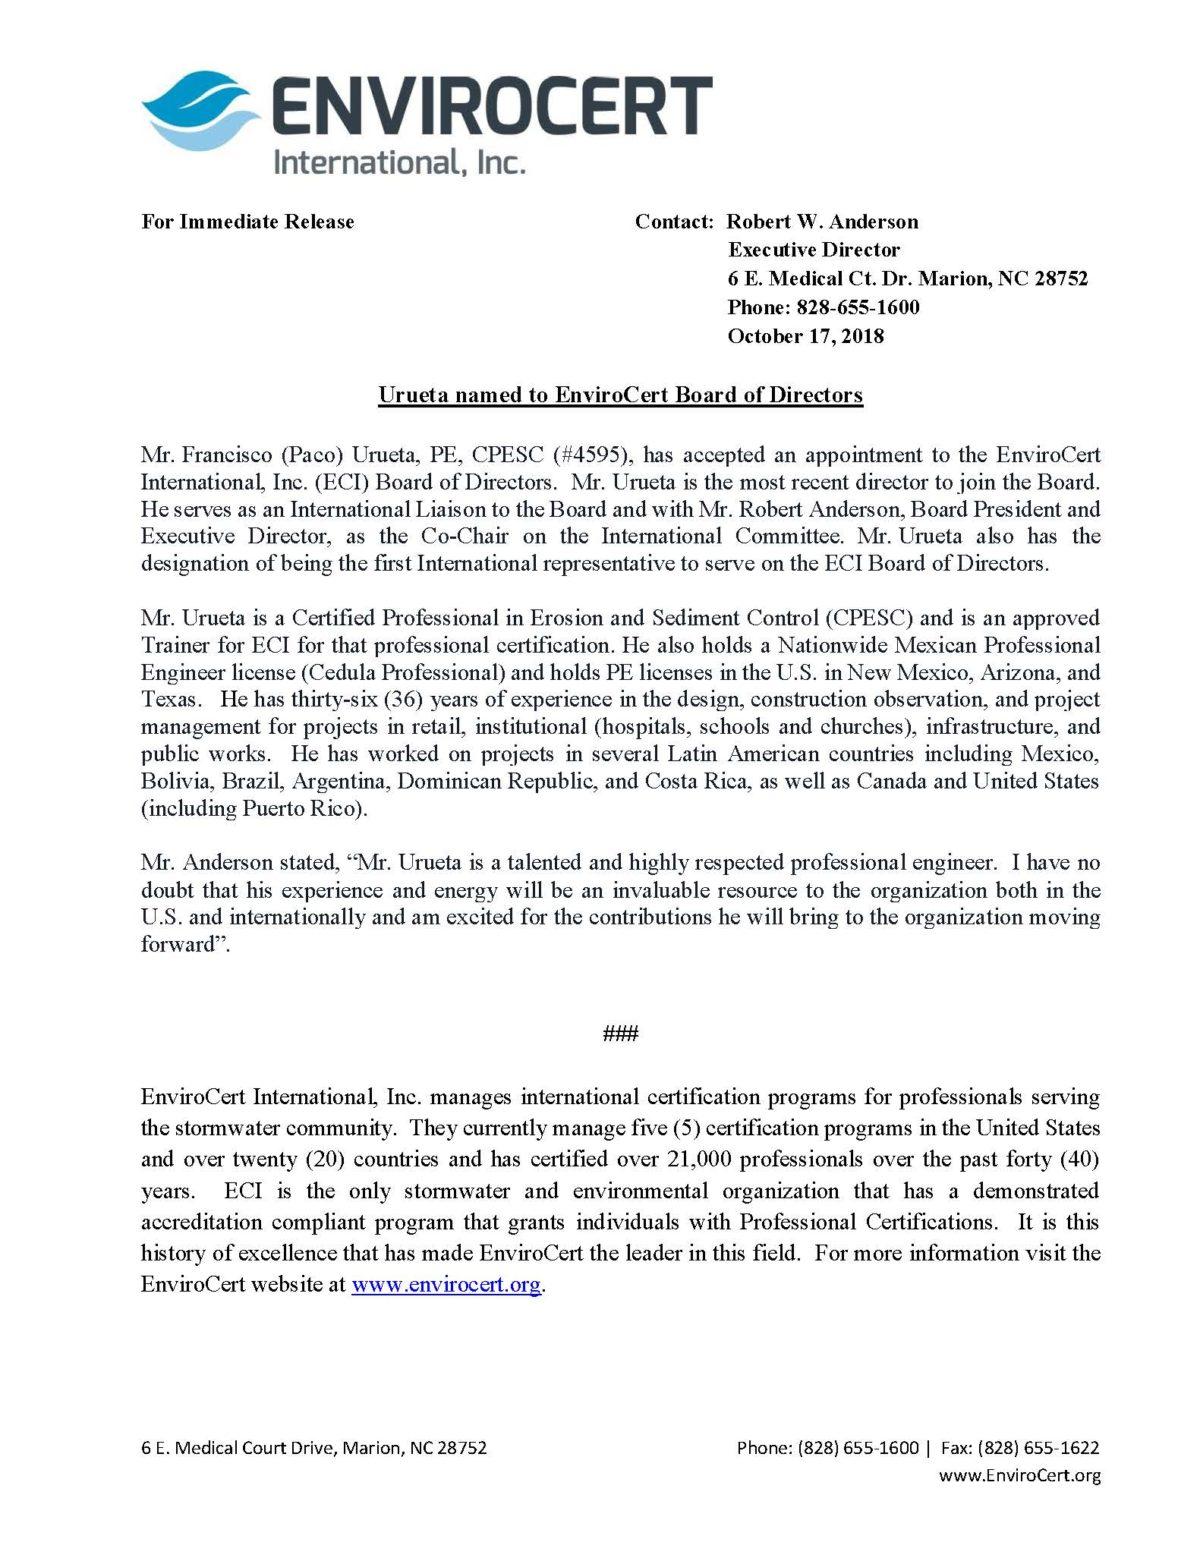 Press Release: Urueta Named to BOD - EnviroCert International. Inc.